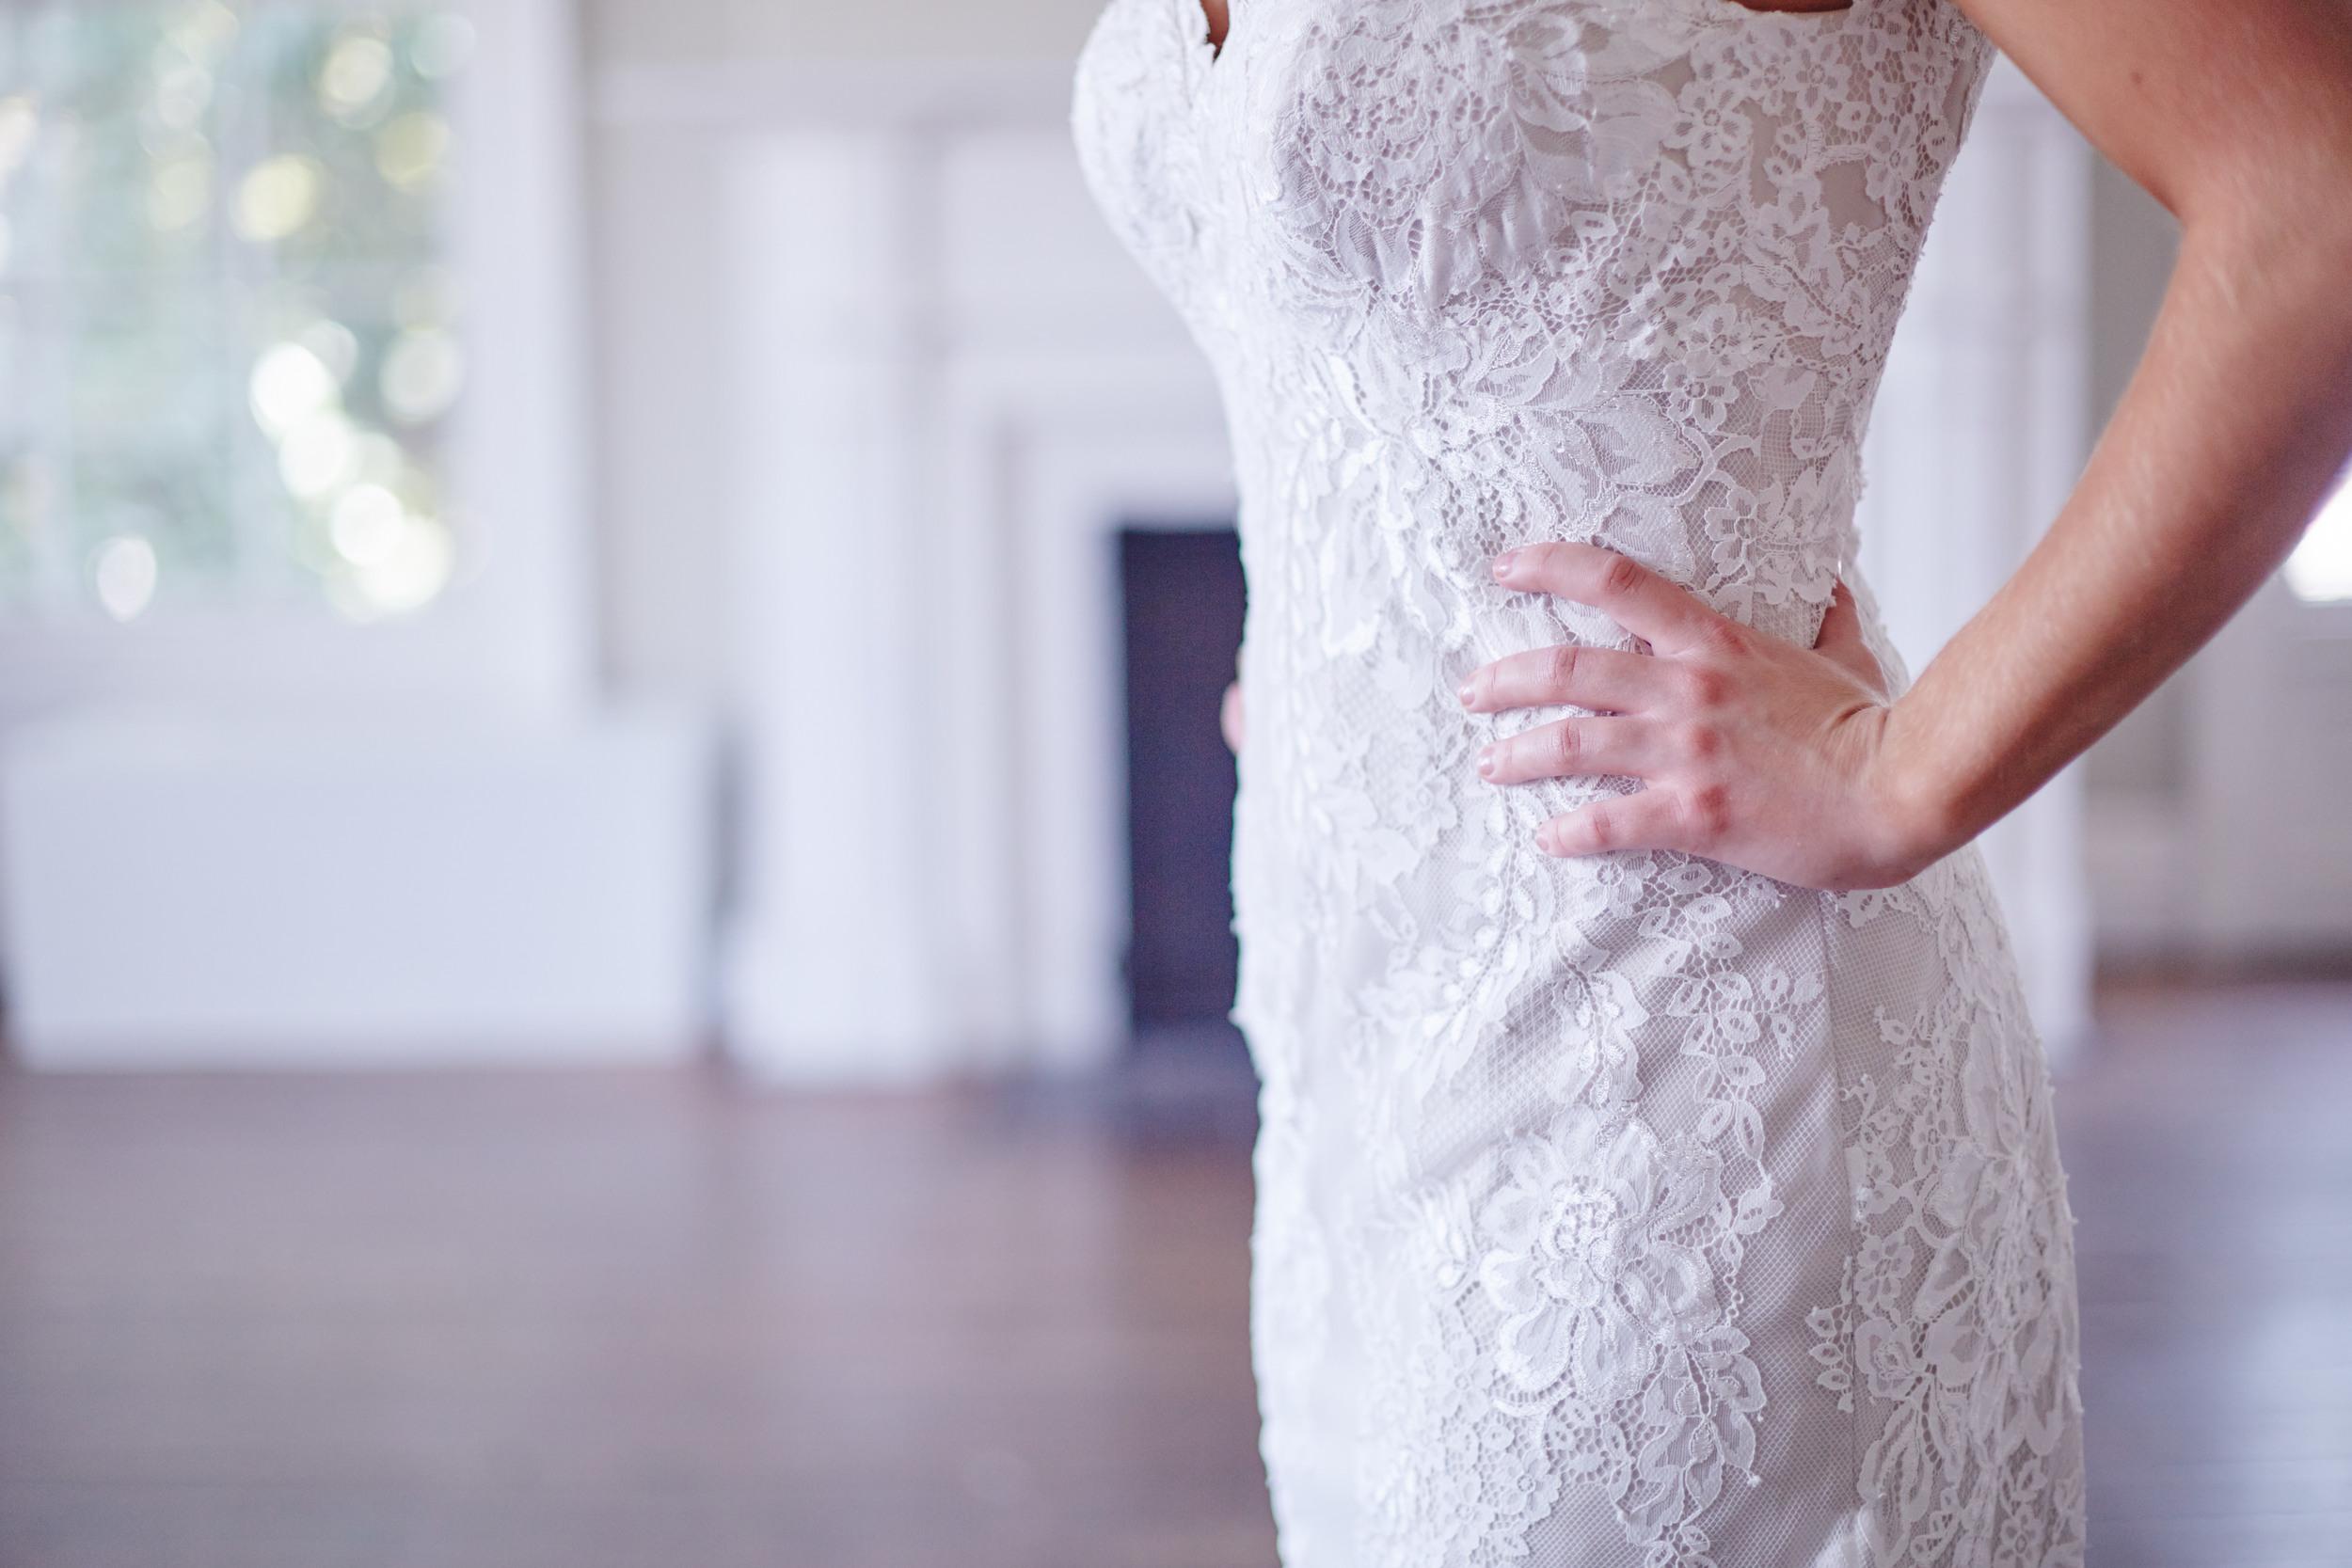 Styled_Session_Becca_Bridal_Portraits_Sarah_Tau_Photography_HOB_Studio_285 45.jpg